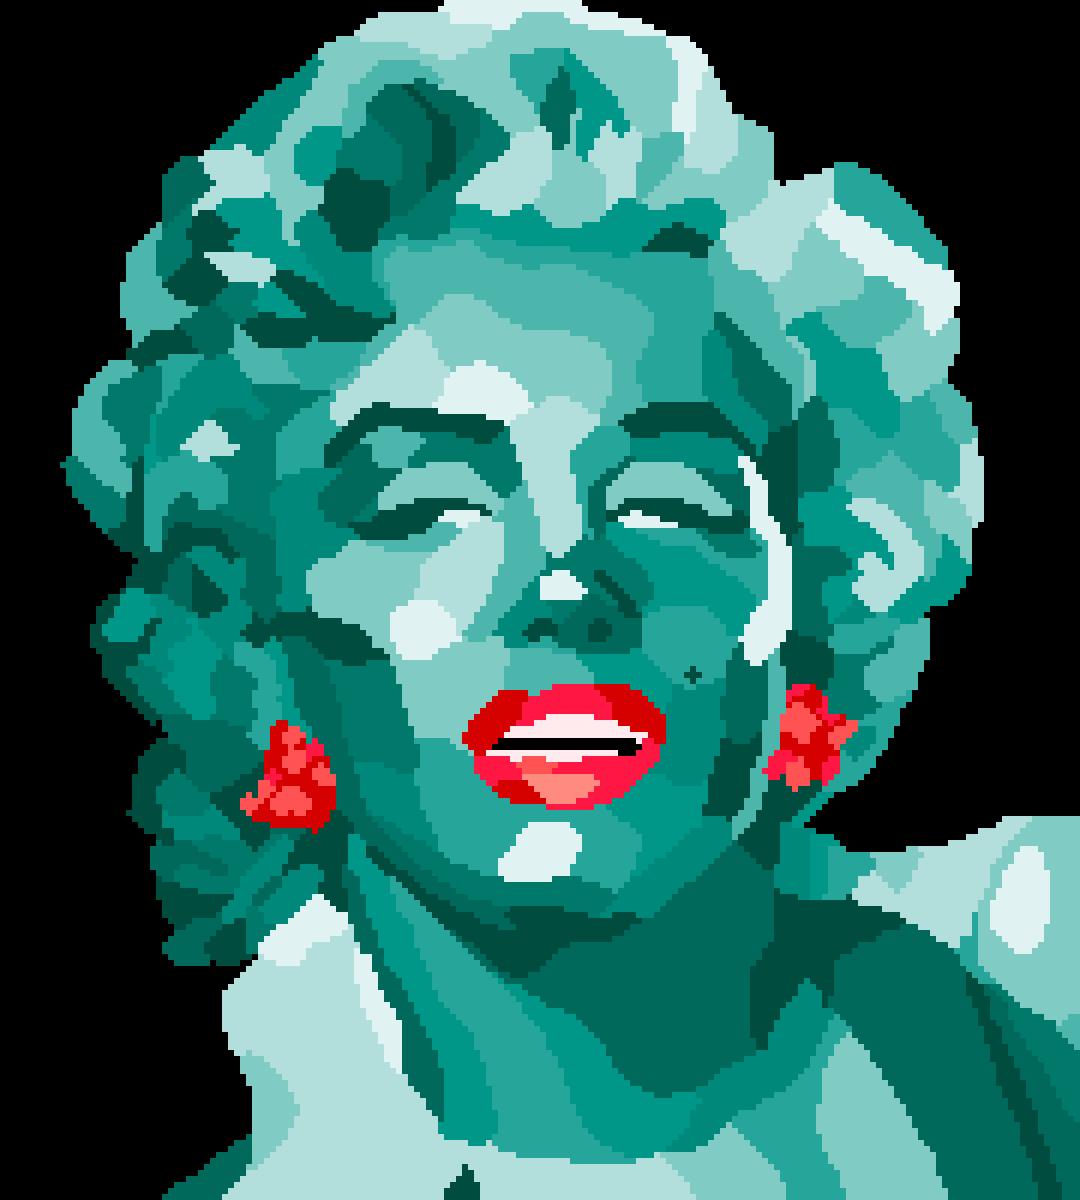 Marilyn Monroe by Thoo